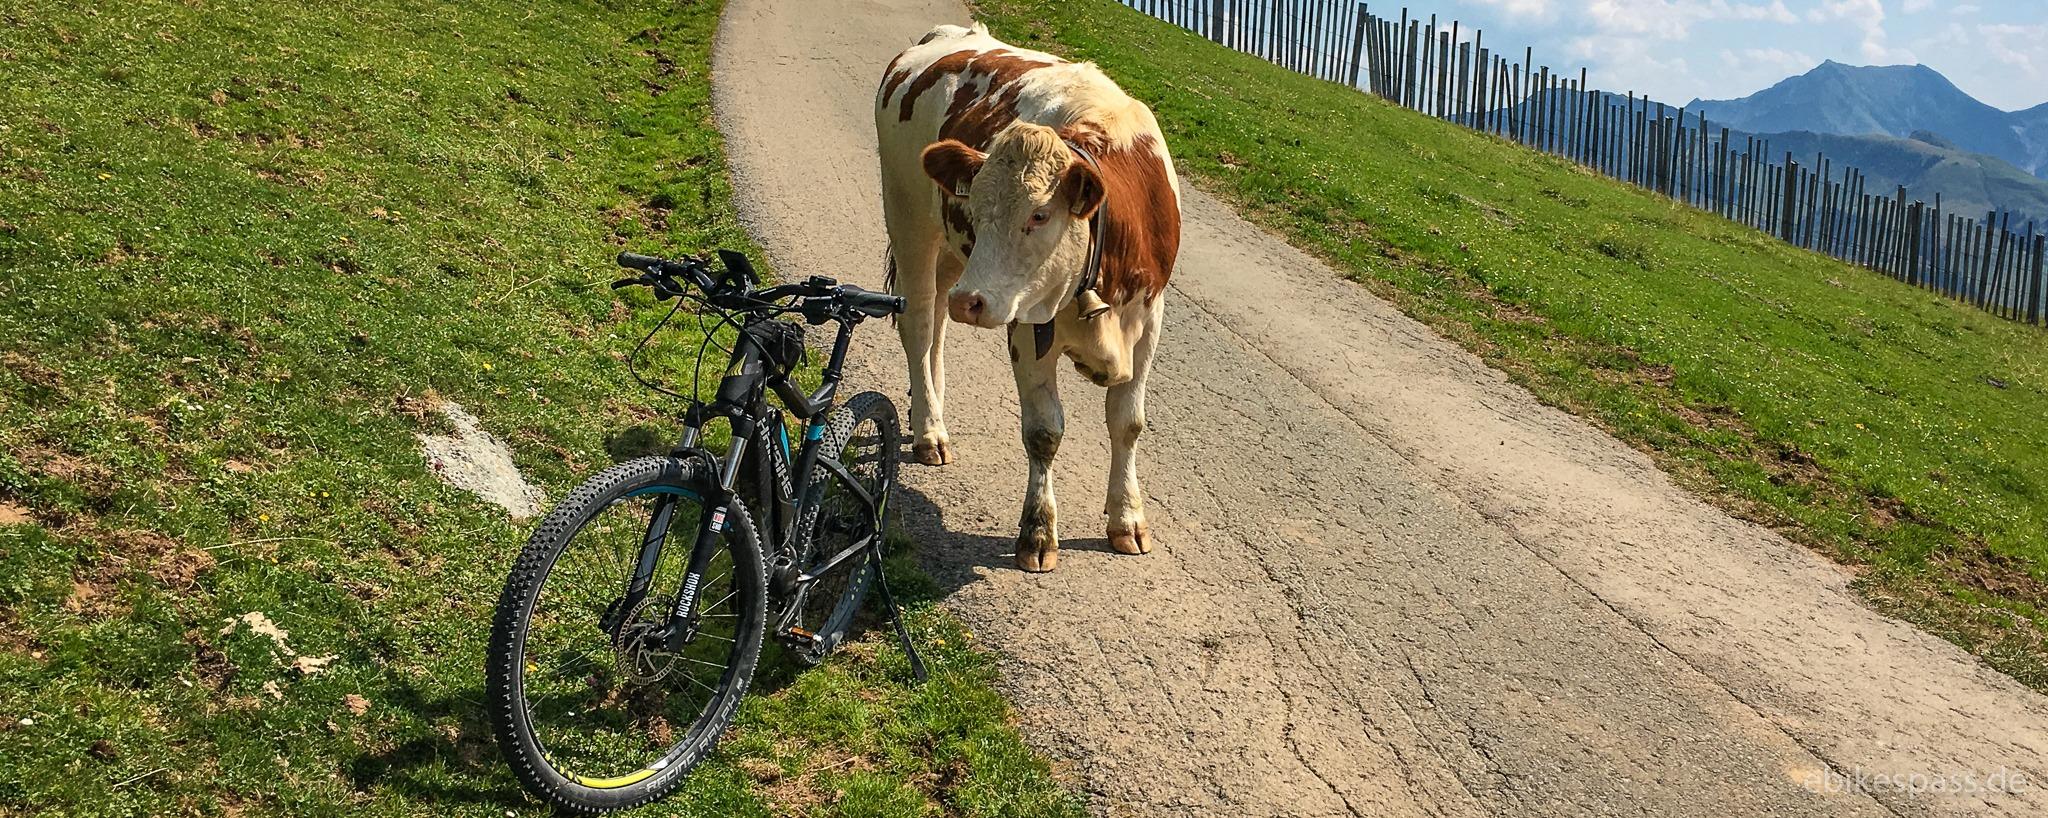 Kühe würden Haibike kaufen … – mit dem E-Bike am Kitzbüheler Horn